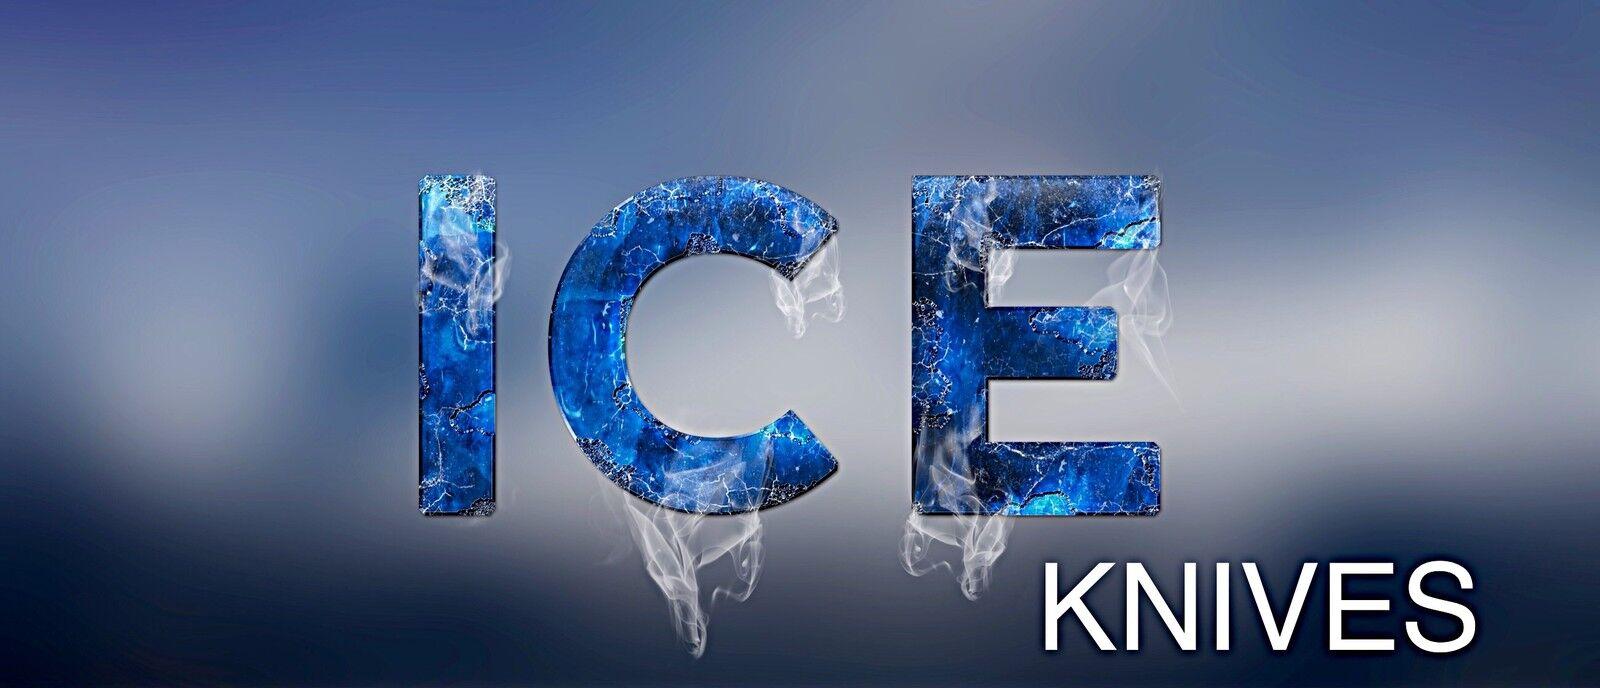 ICEKnives